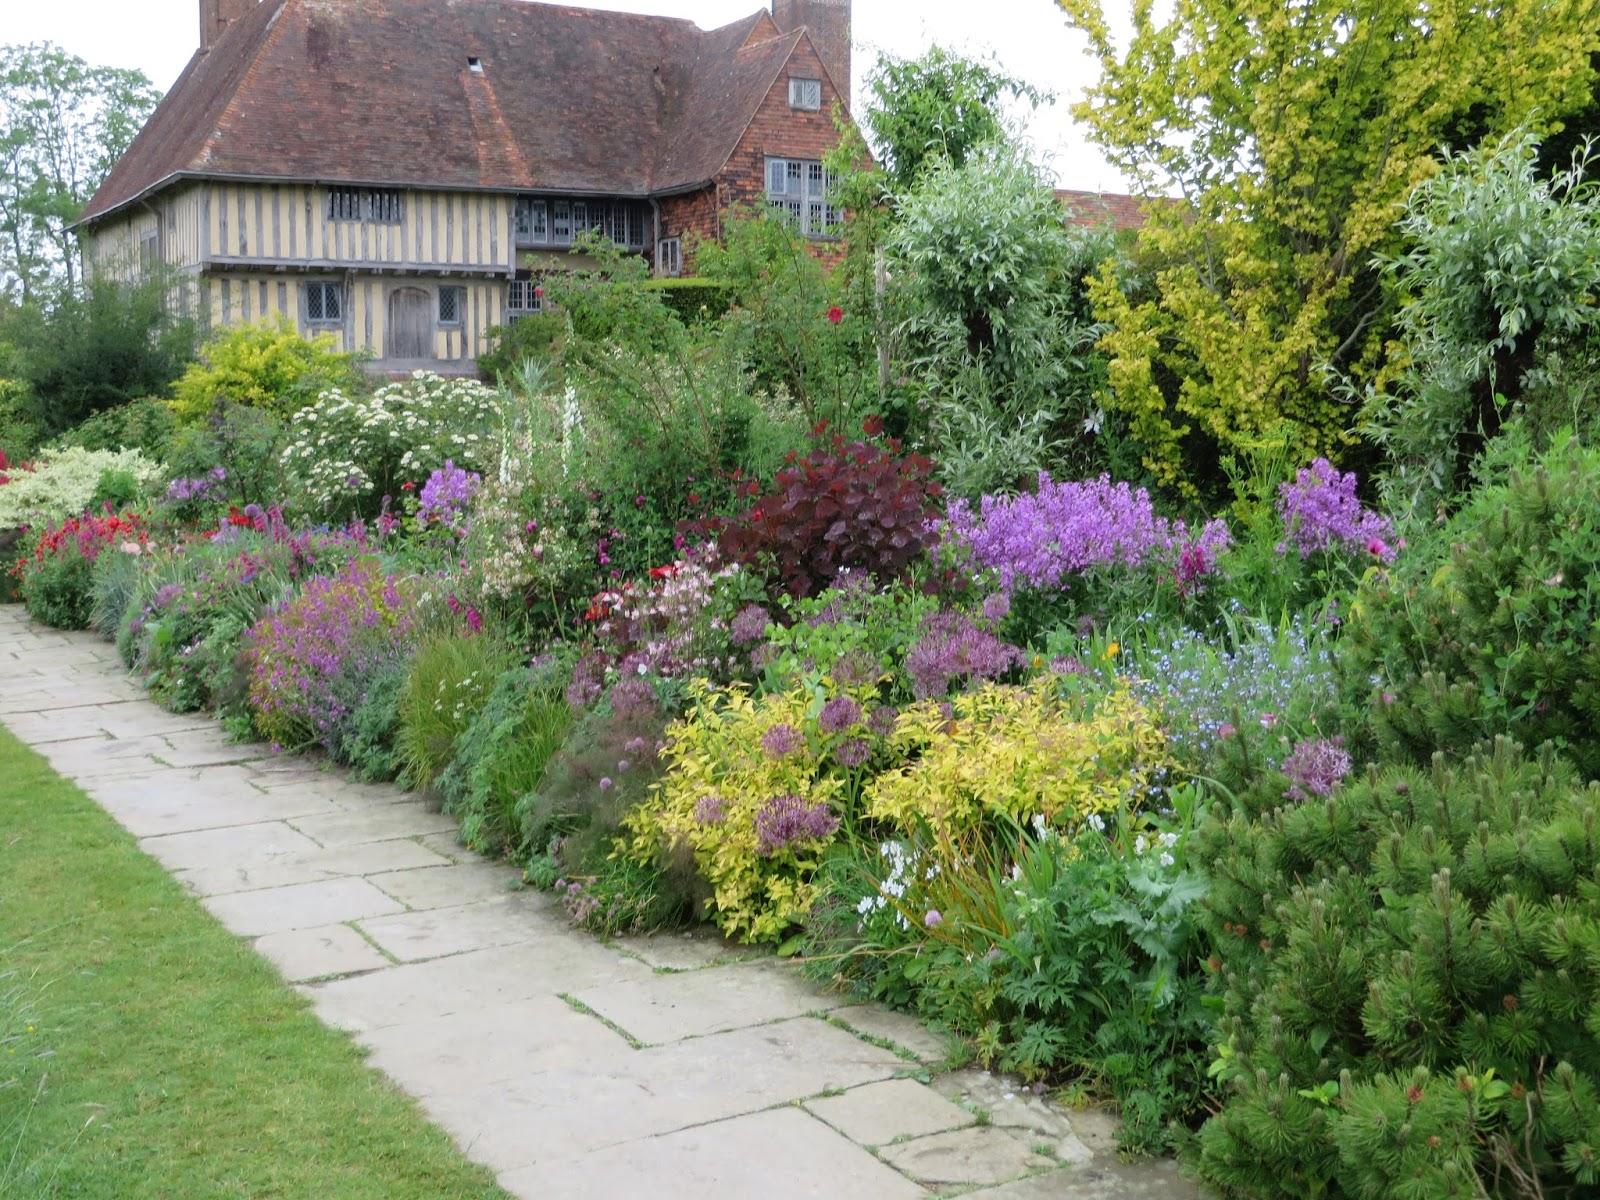 Garden grove borders : The gardener s eye quot passionate tour may